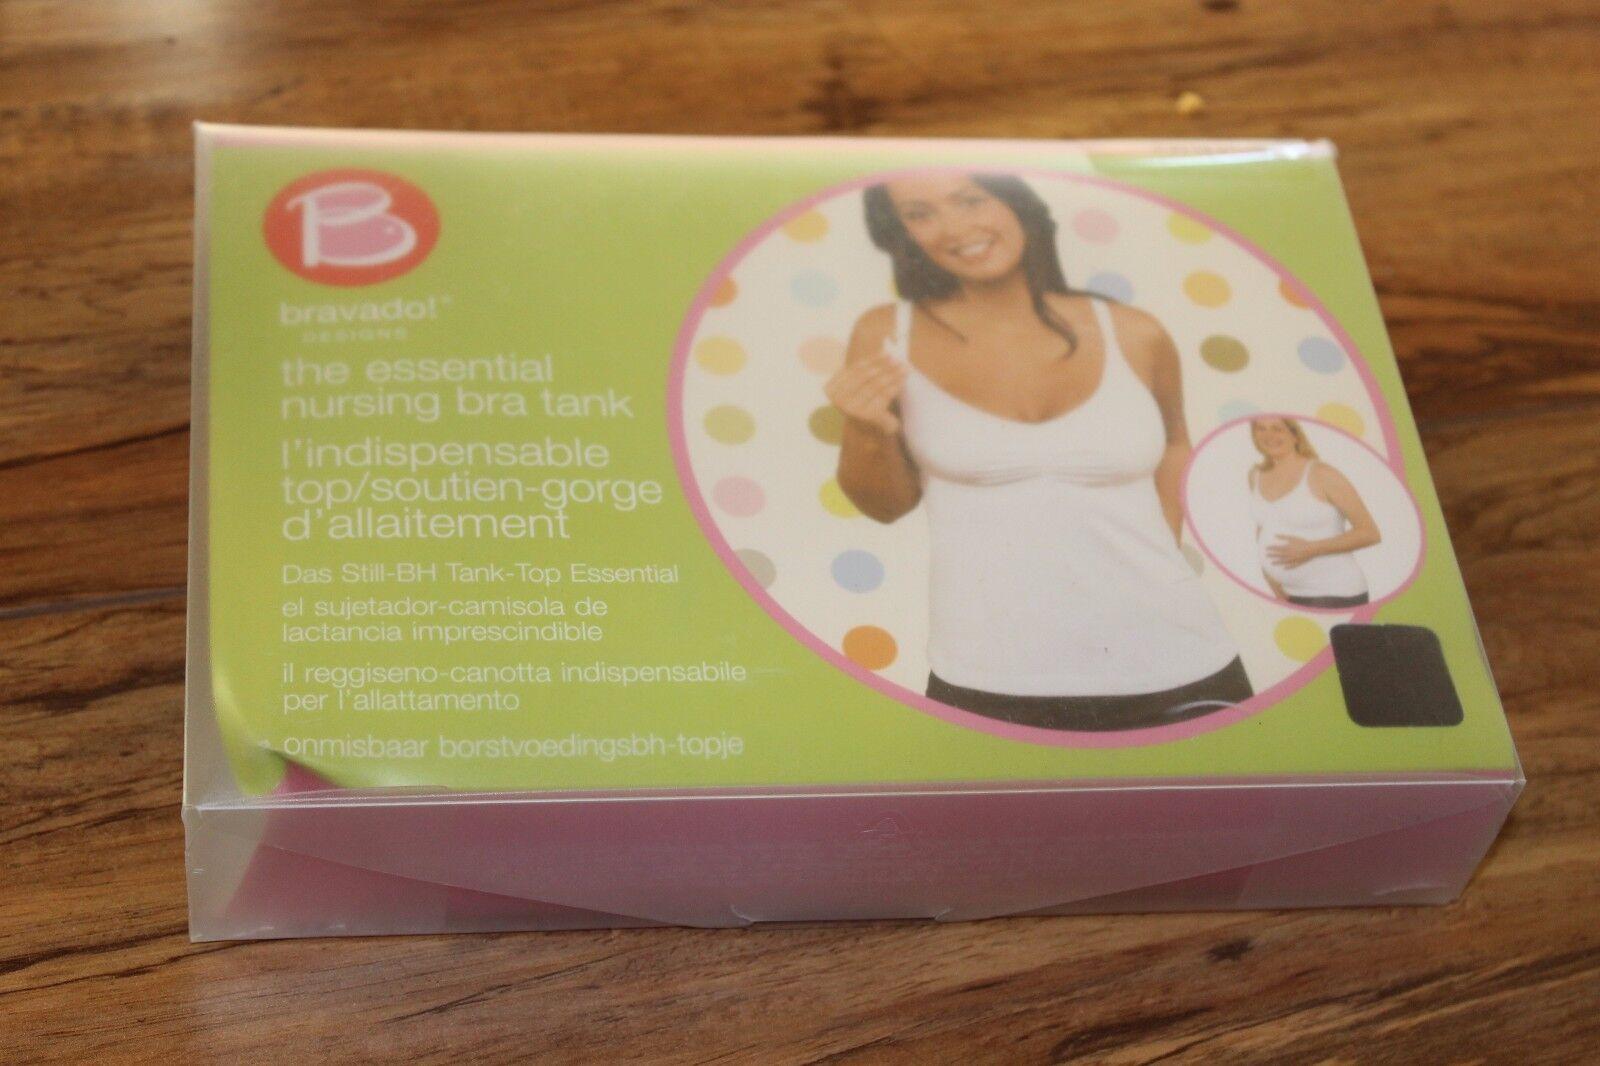 Bravado Essential Nursing Bra Tank Top New but packing is li